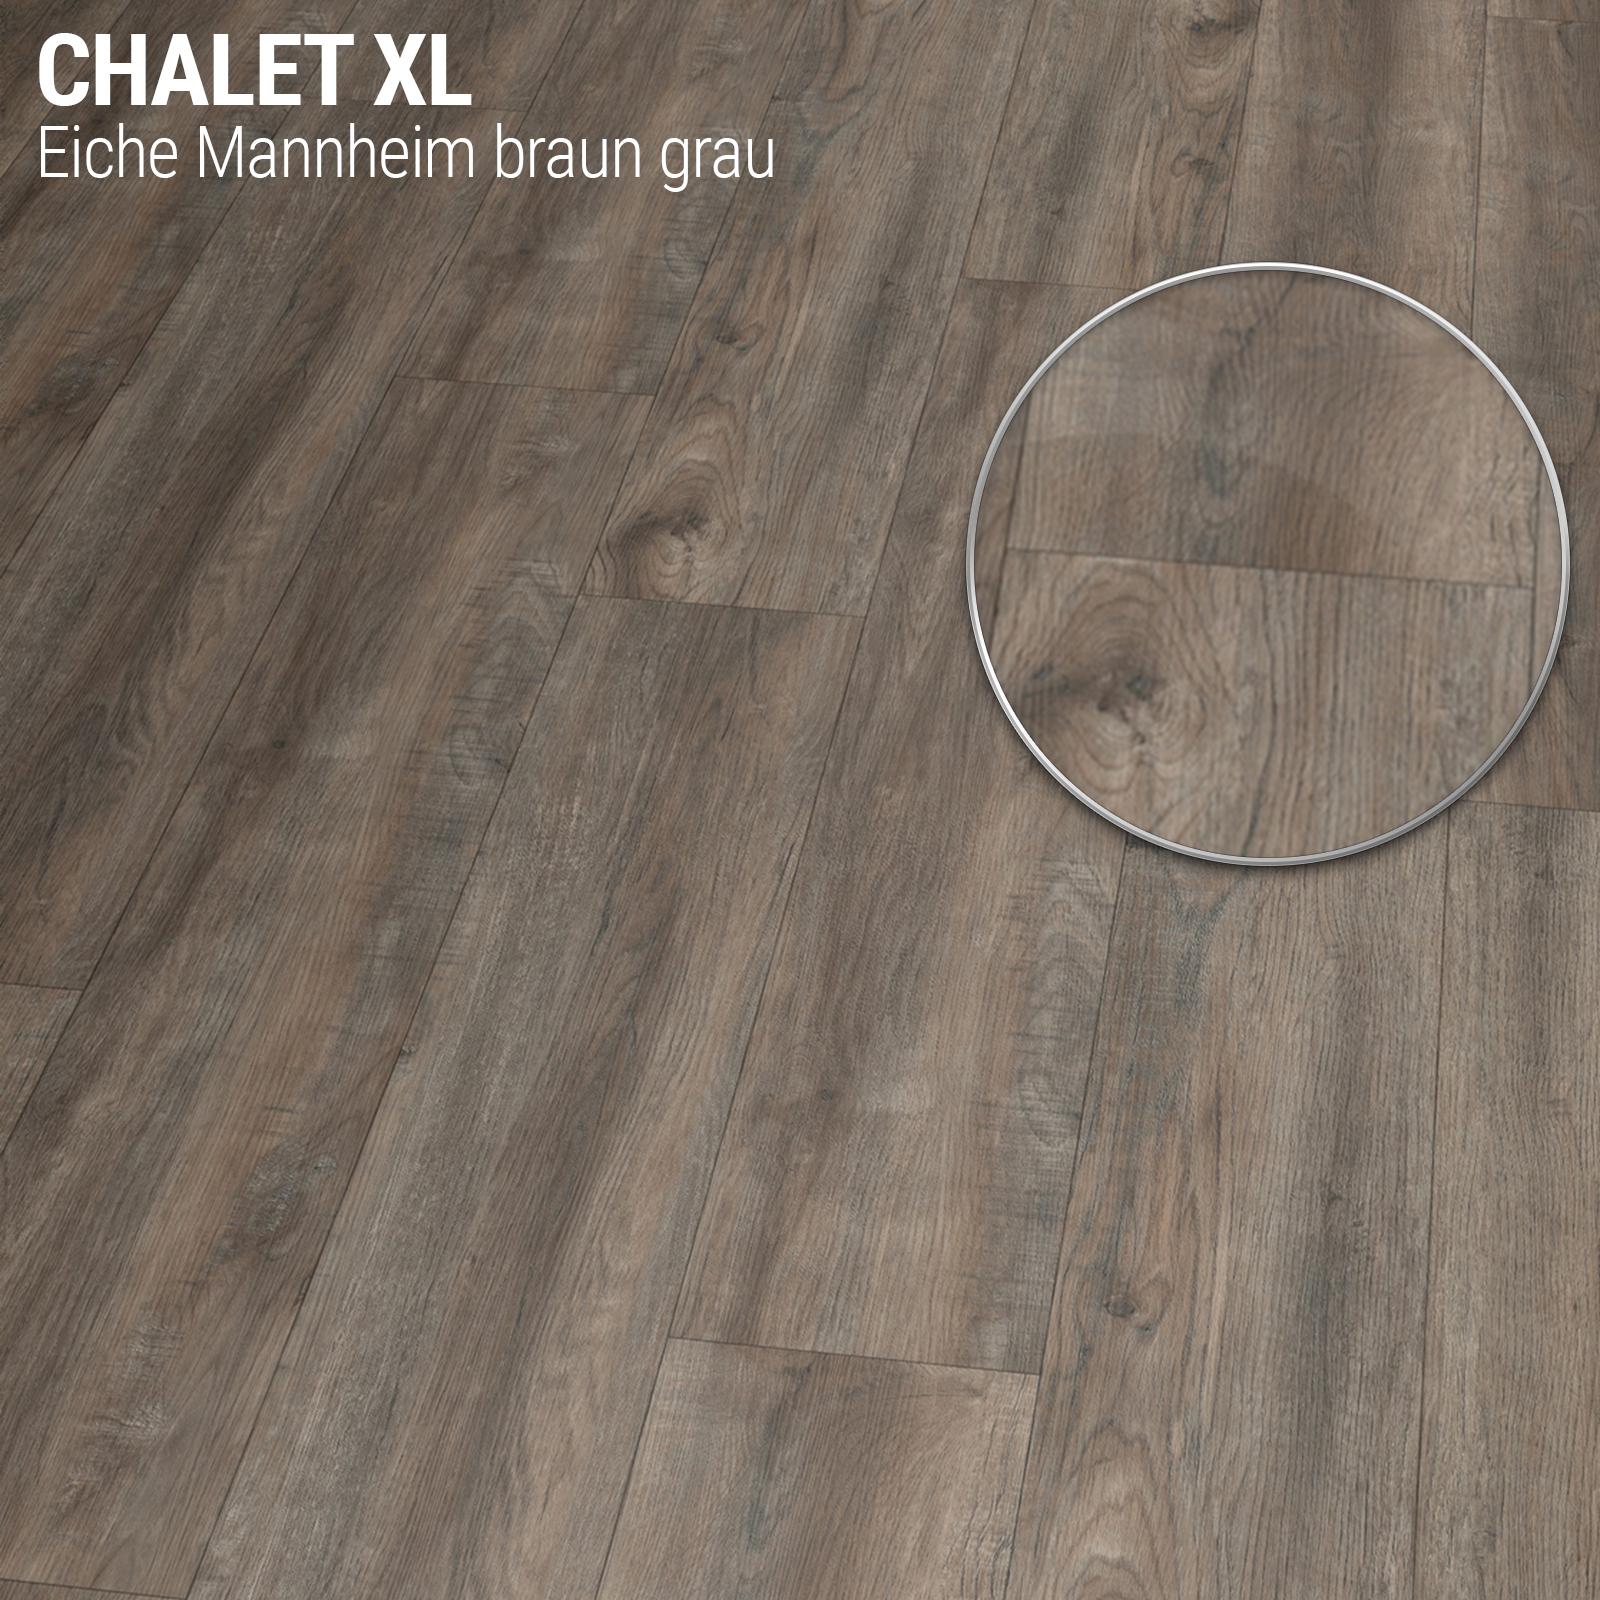 vinylboden pvc klick dielen bodenbelag royal chalet eiche